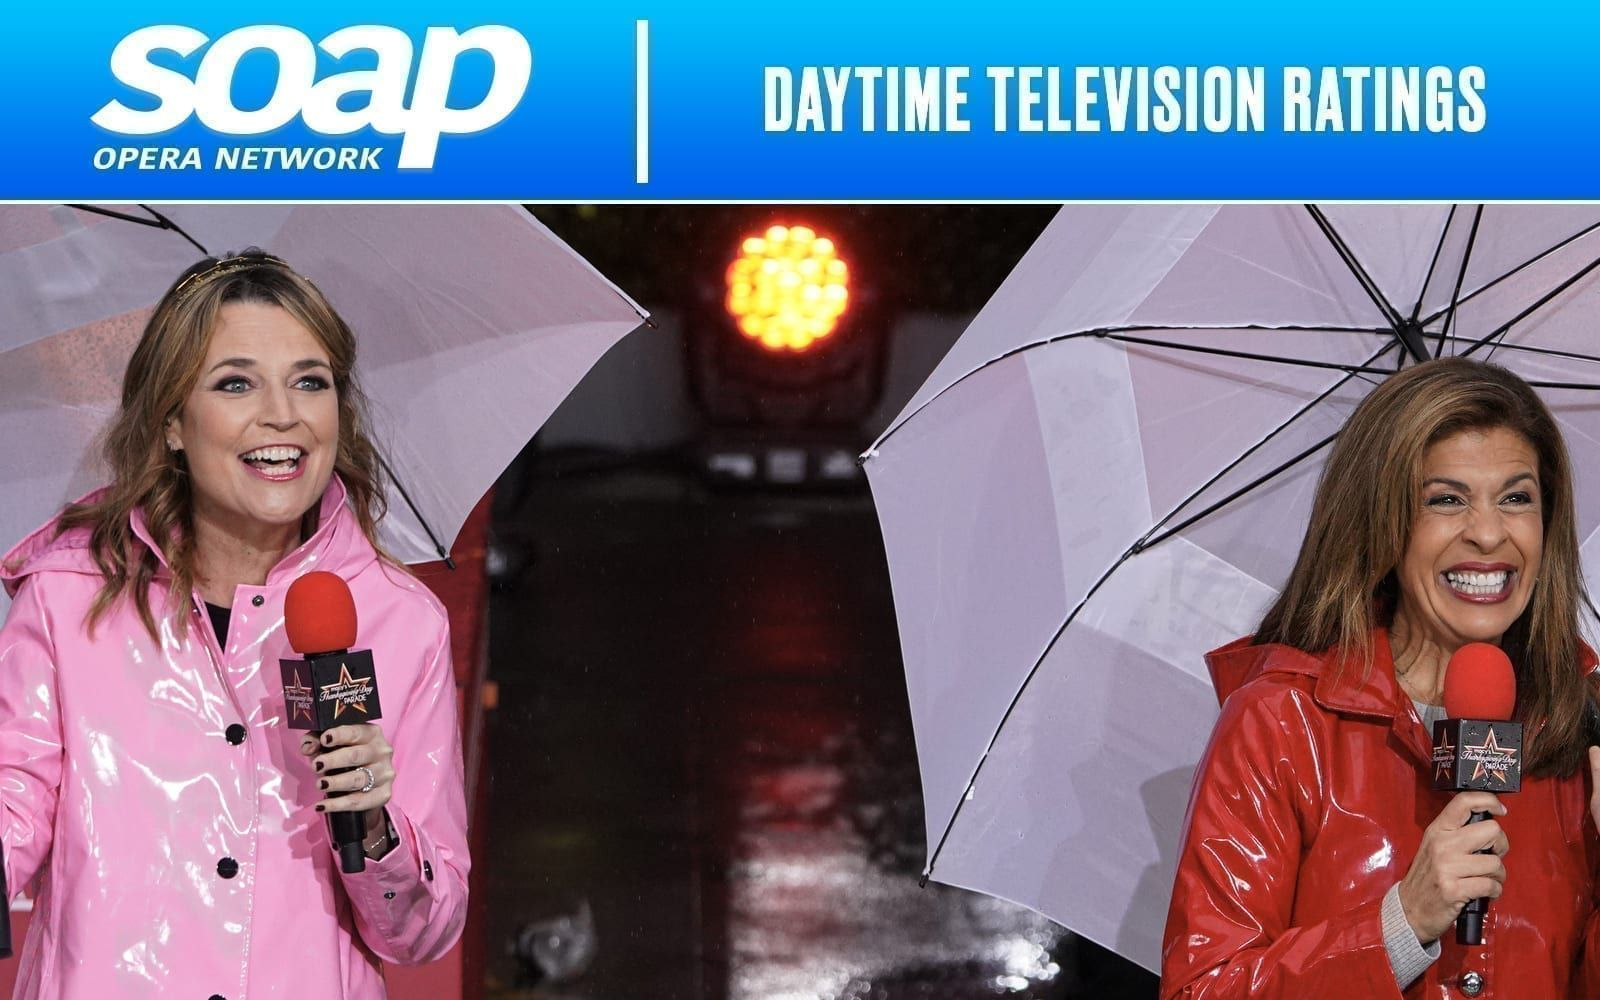 Savannah Guthrie, Hoda Kotb, Daytime Television Ratings, File